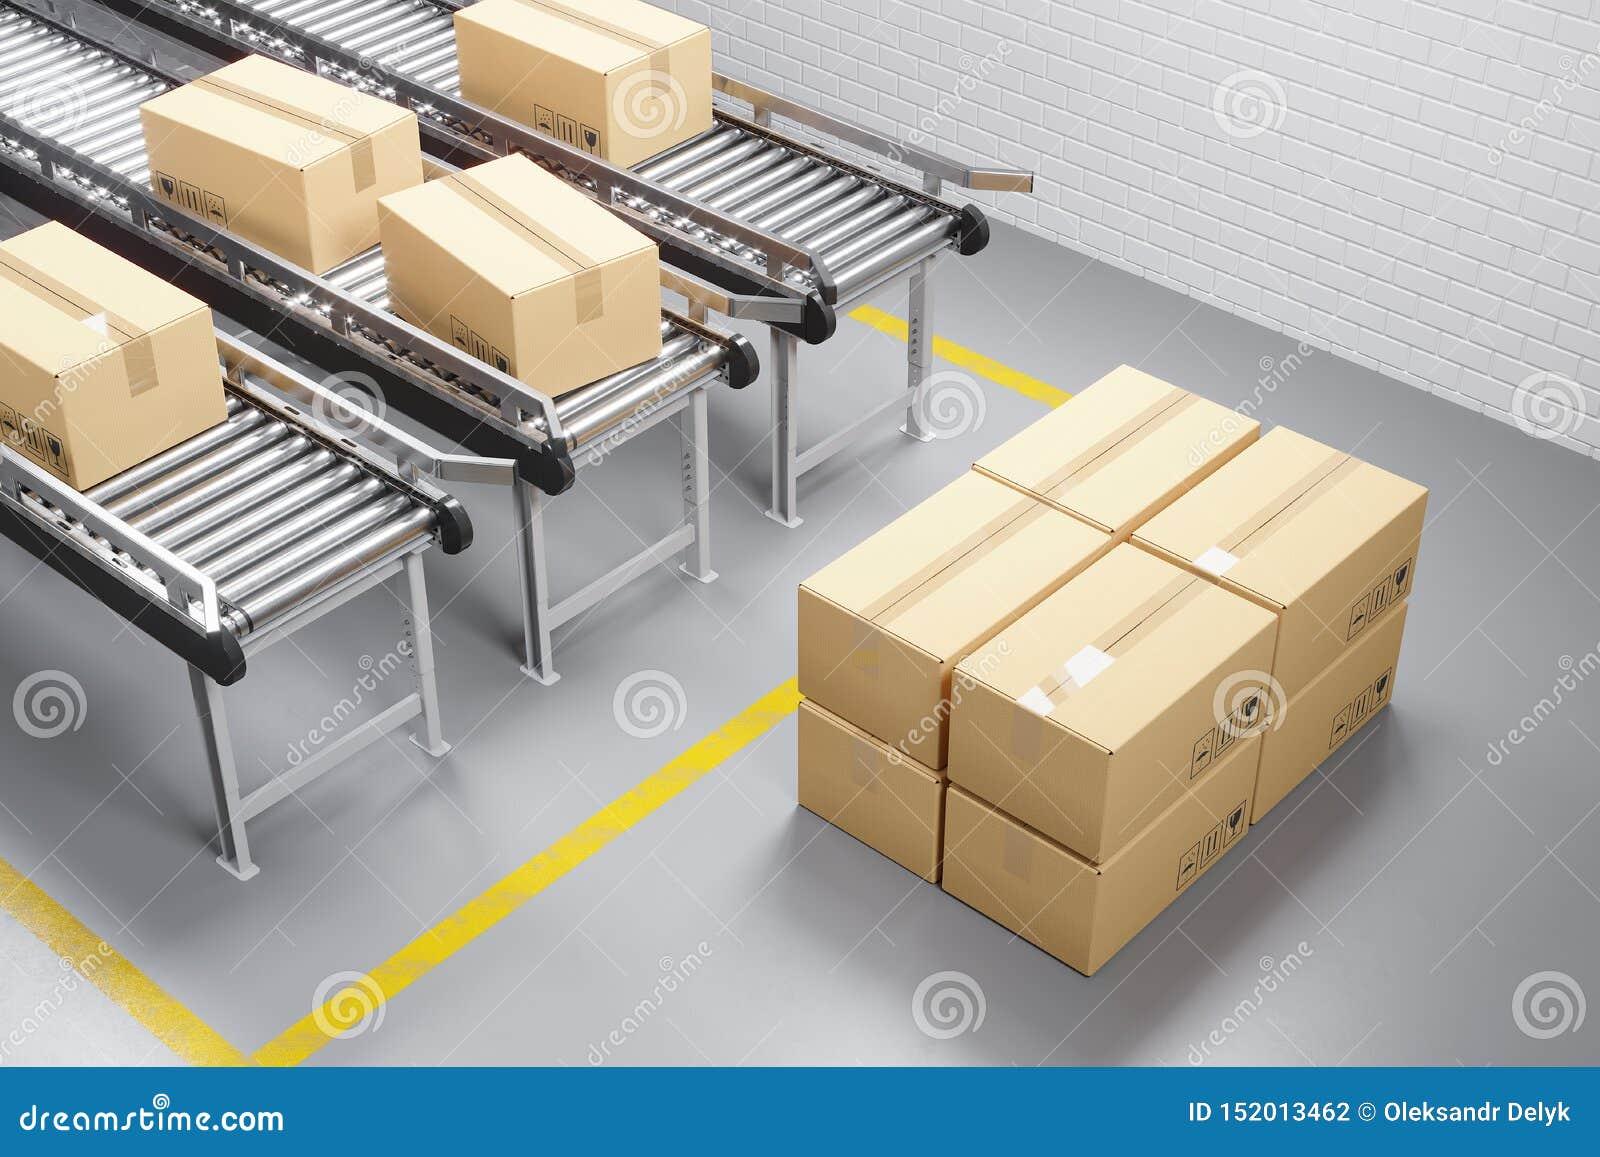 транспортер на складах